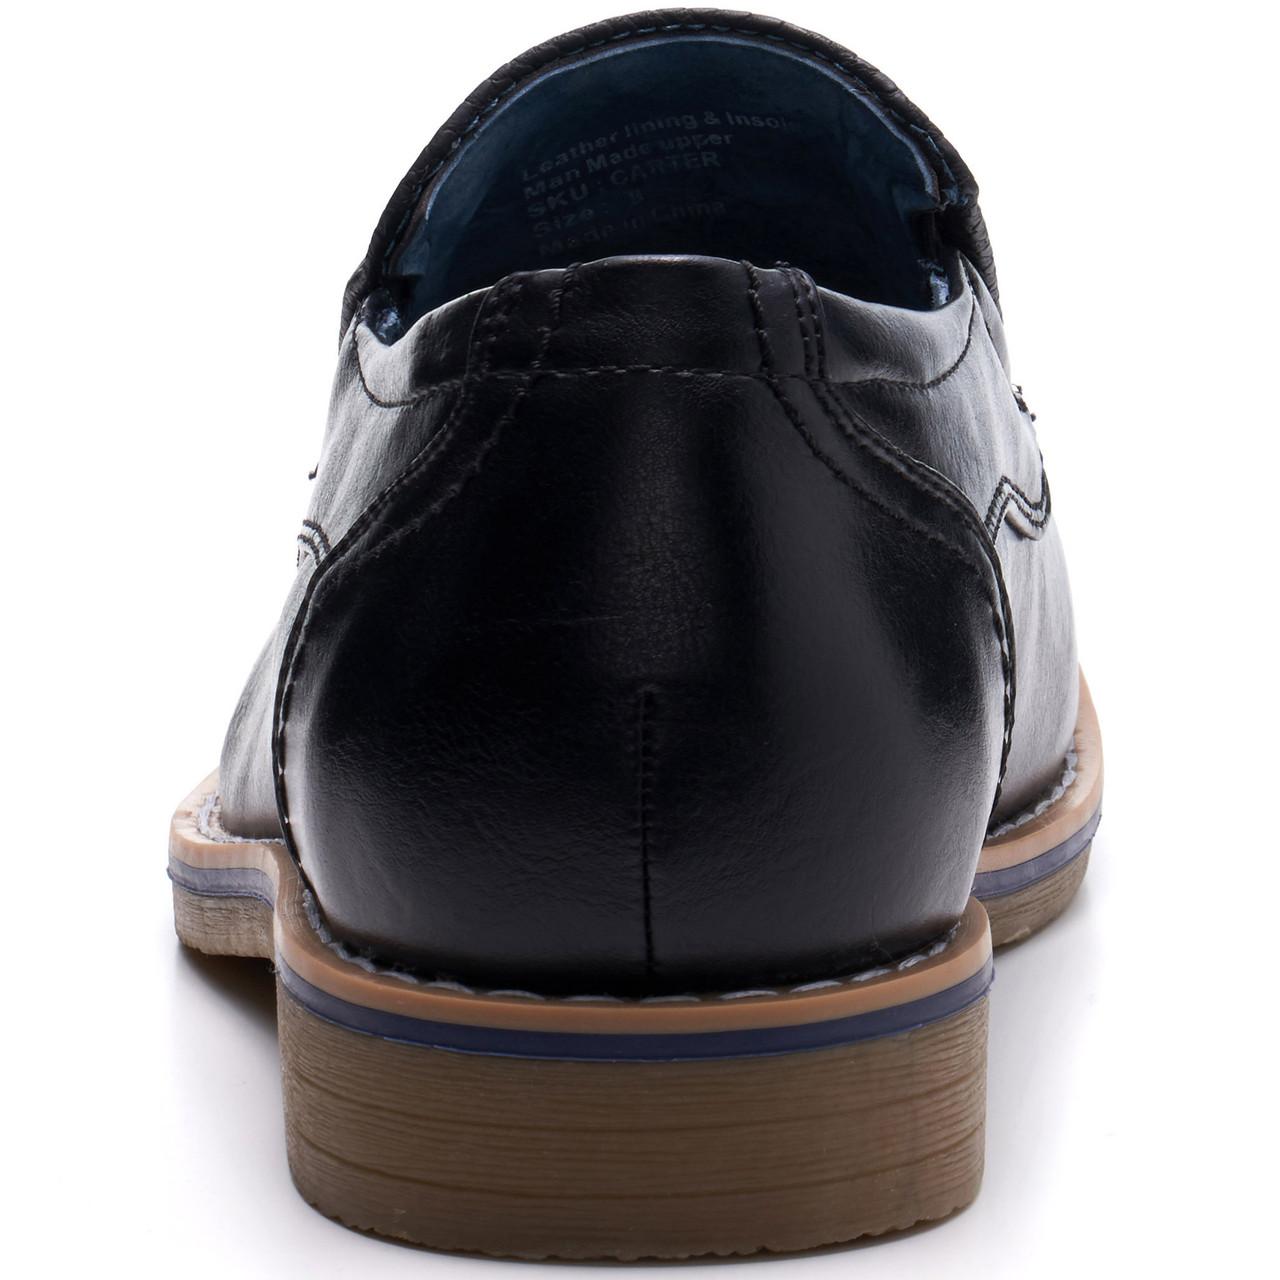 0211ee79d41 Alpine Swiss Carter Mens Slip On Loafers Snakeskin Dress Shoes